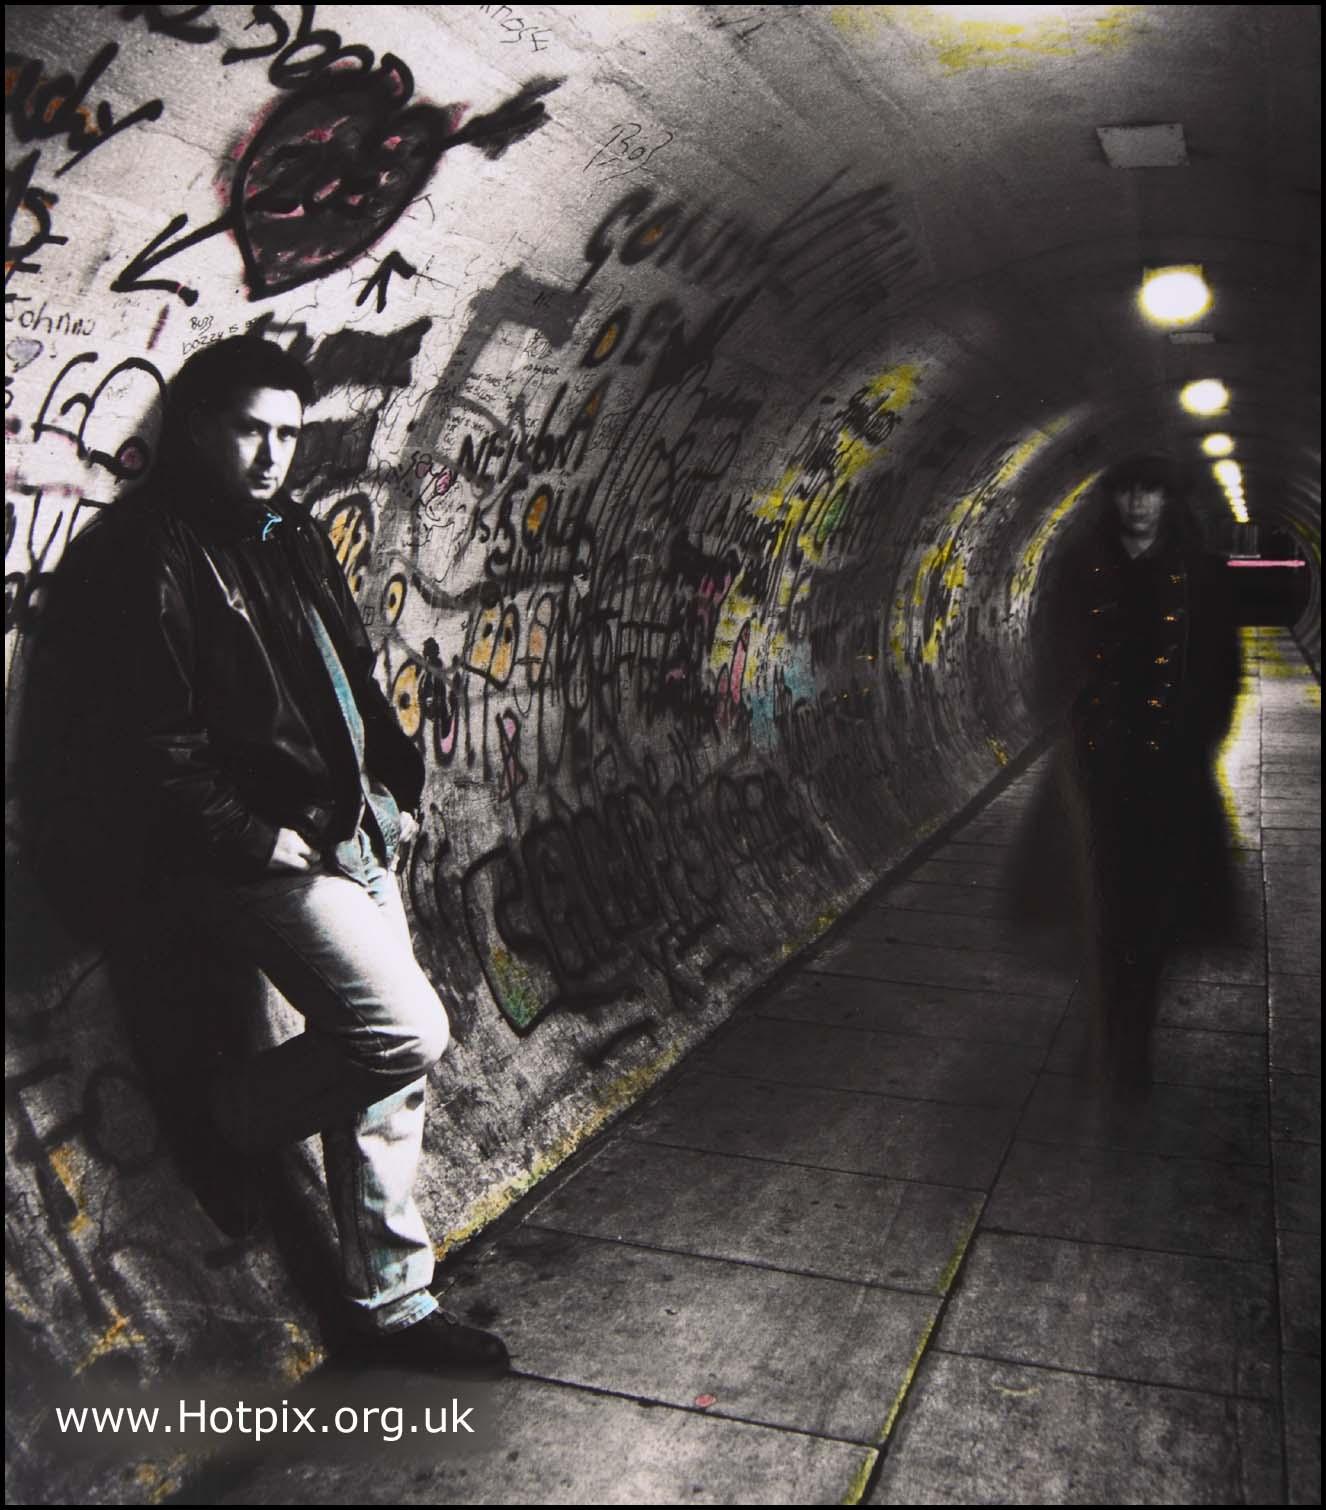 Tunnel,strangers,BW,toned,hand,colored,color,colour,Latchford,danger,dangerous,walk,night,path,way,pathway,Warrington,graffitti,grafitti,graffiti,dirty,black,white,mono,monochrome,partial,mixed,selctive,colores,Hotpicks,hotpics,hot,pics,pix,picks,interesting,place,places,hotpix!